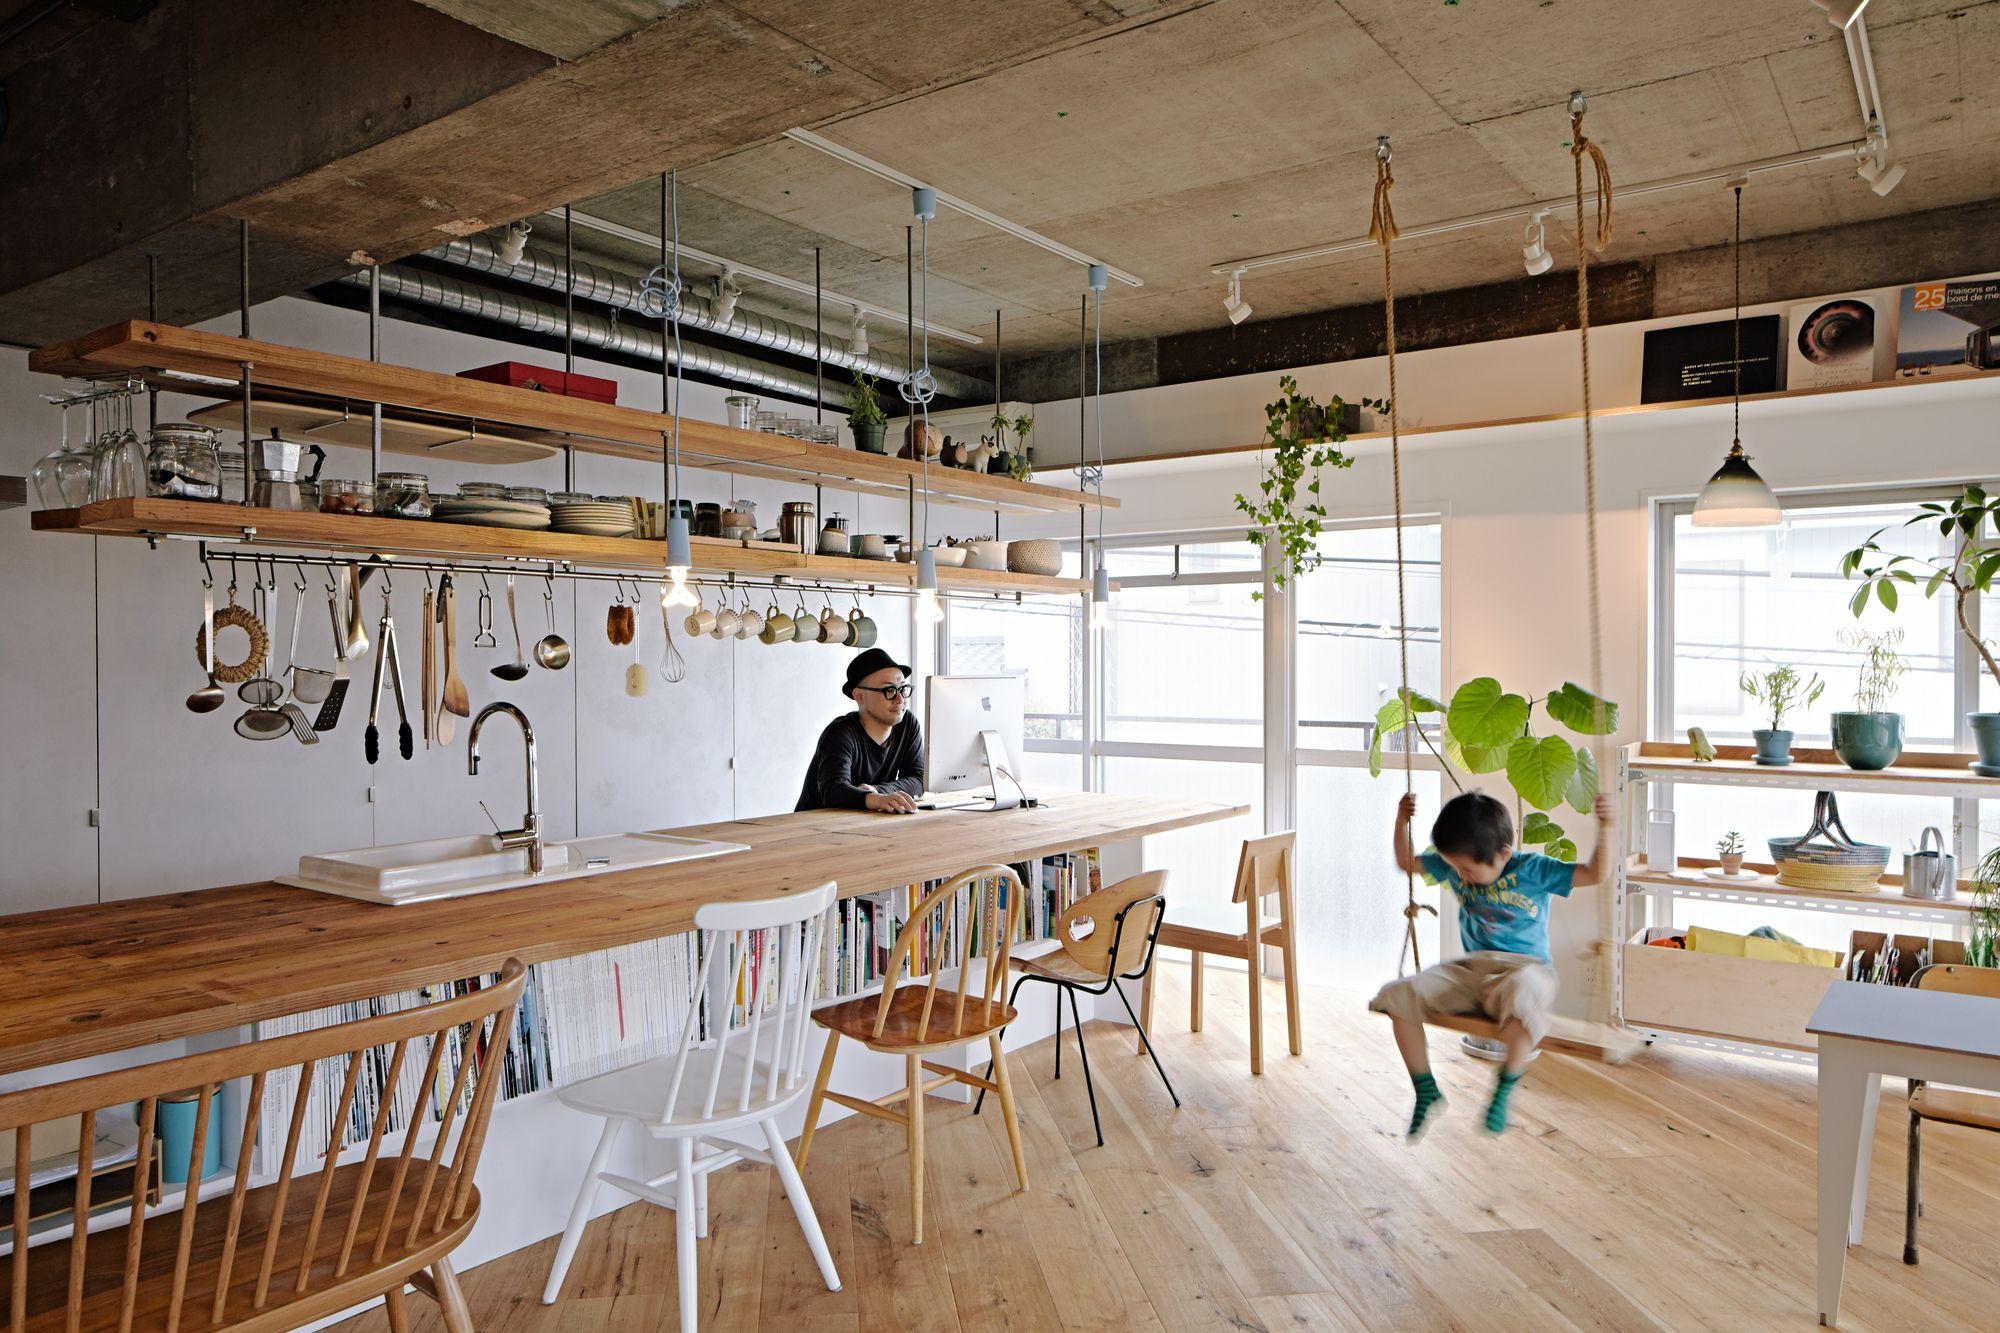 Tenhachi House - .8 Tenhachi Architect & Interior Design - Tokyo ...